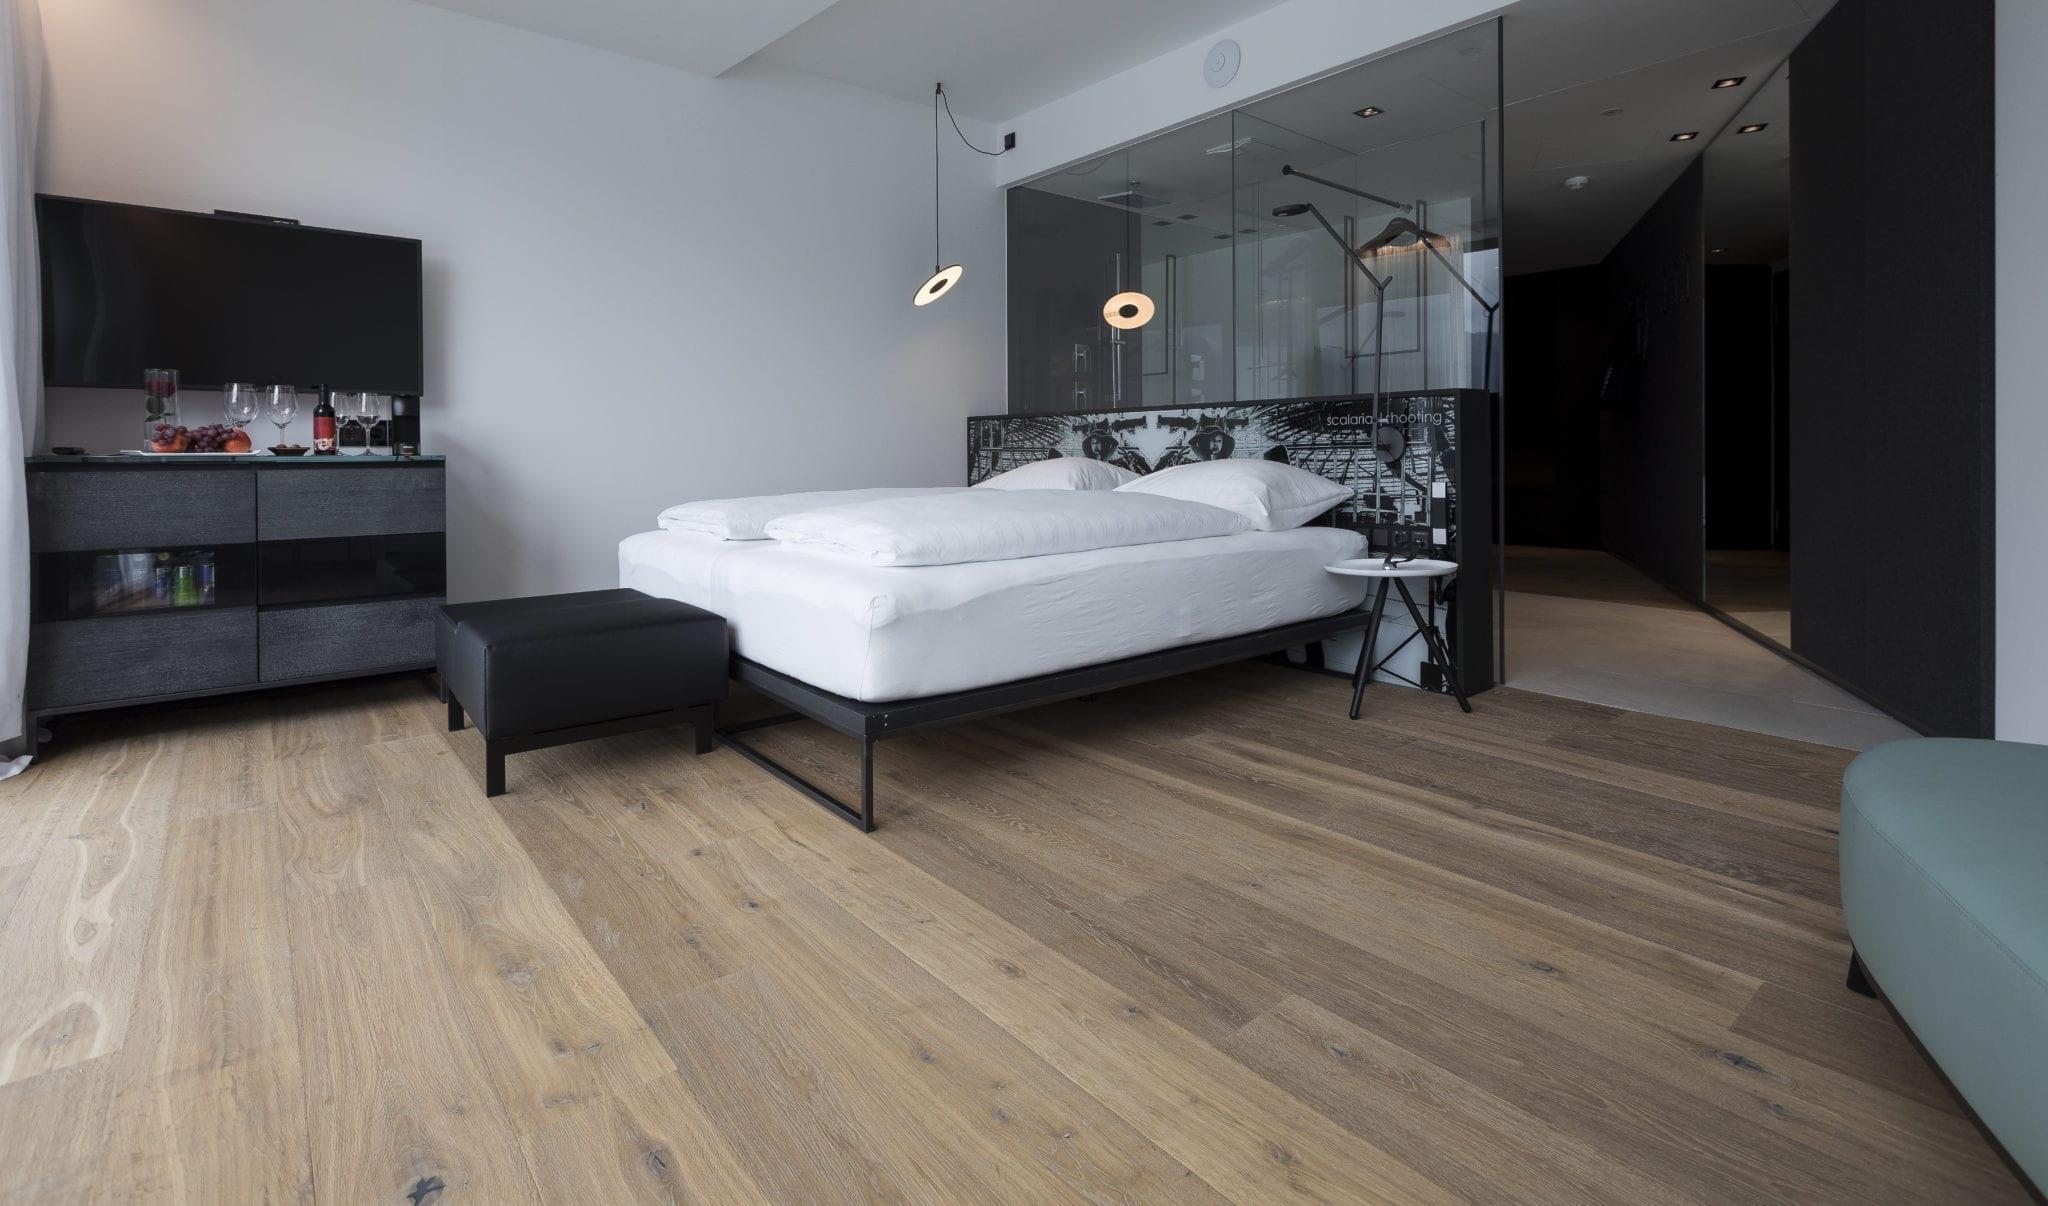 Admonter Floors Eiche Lapis rustic alpin Scalaria Wolfgangsee 1 scaled